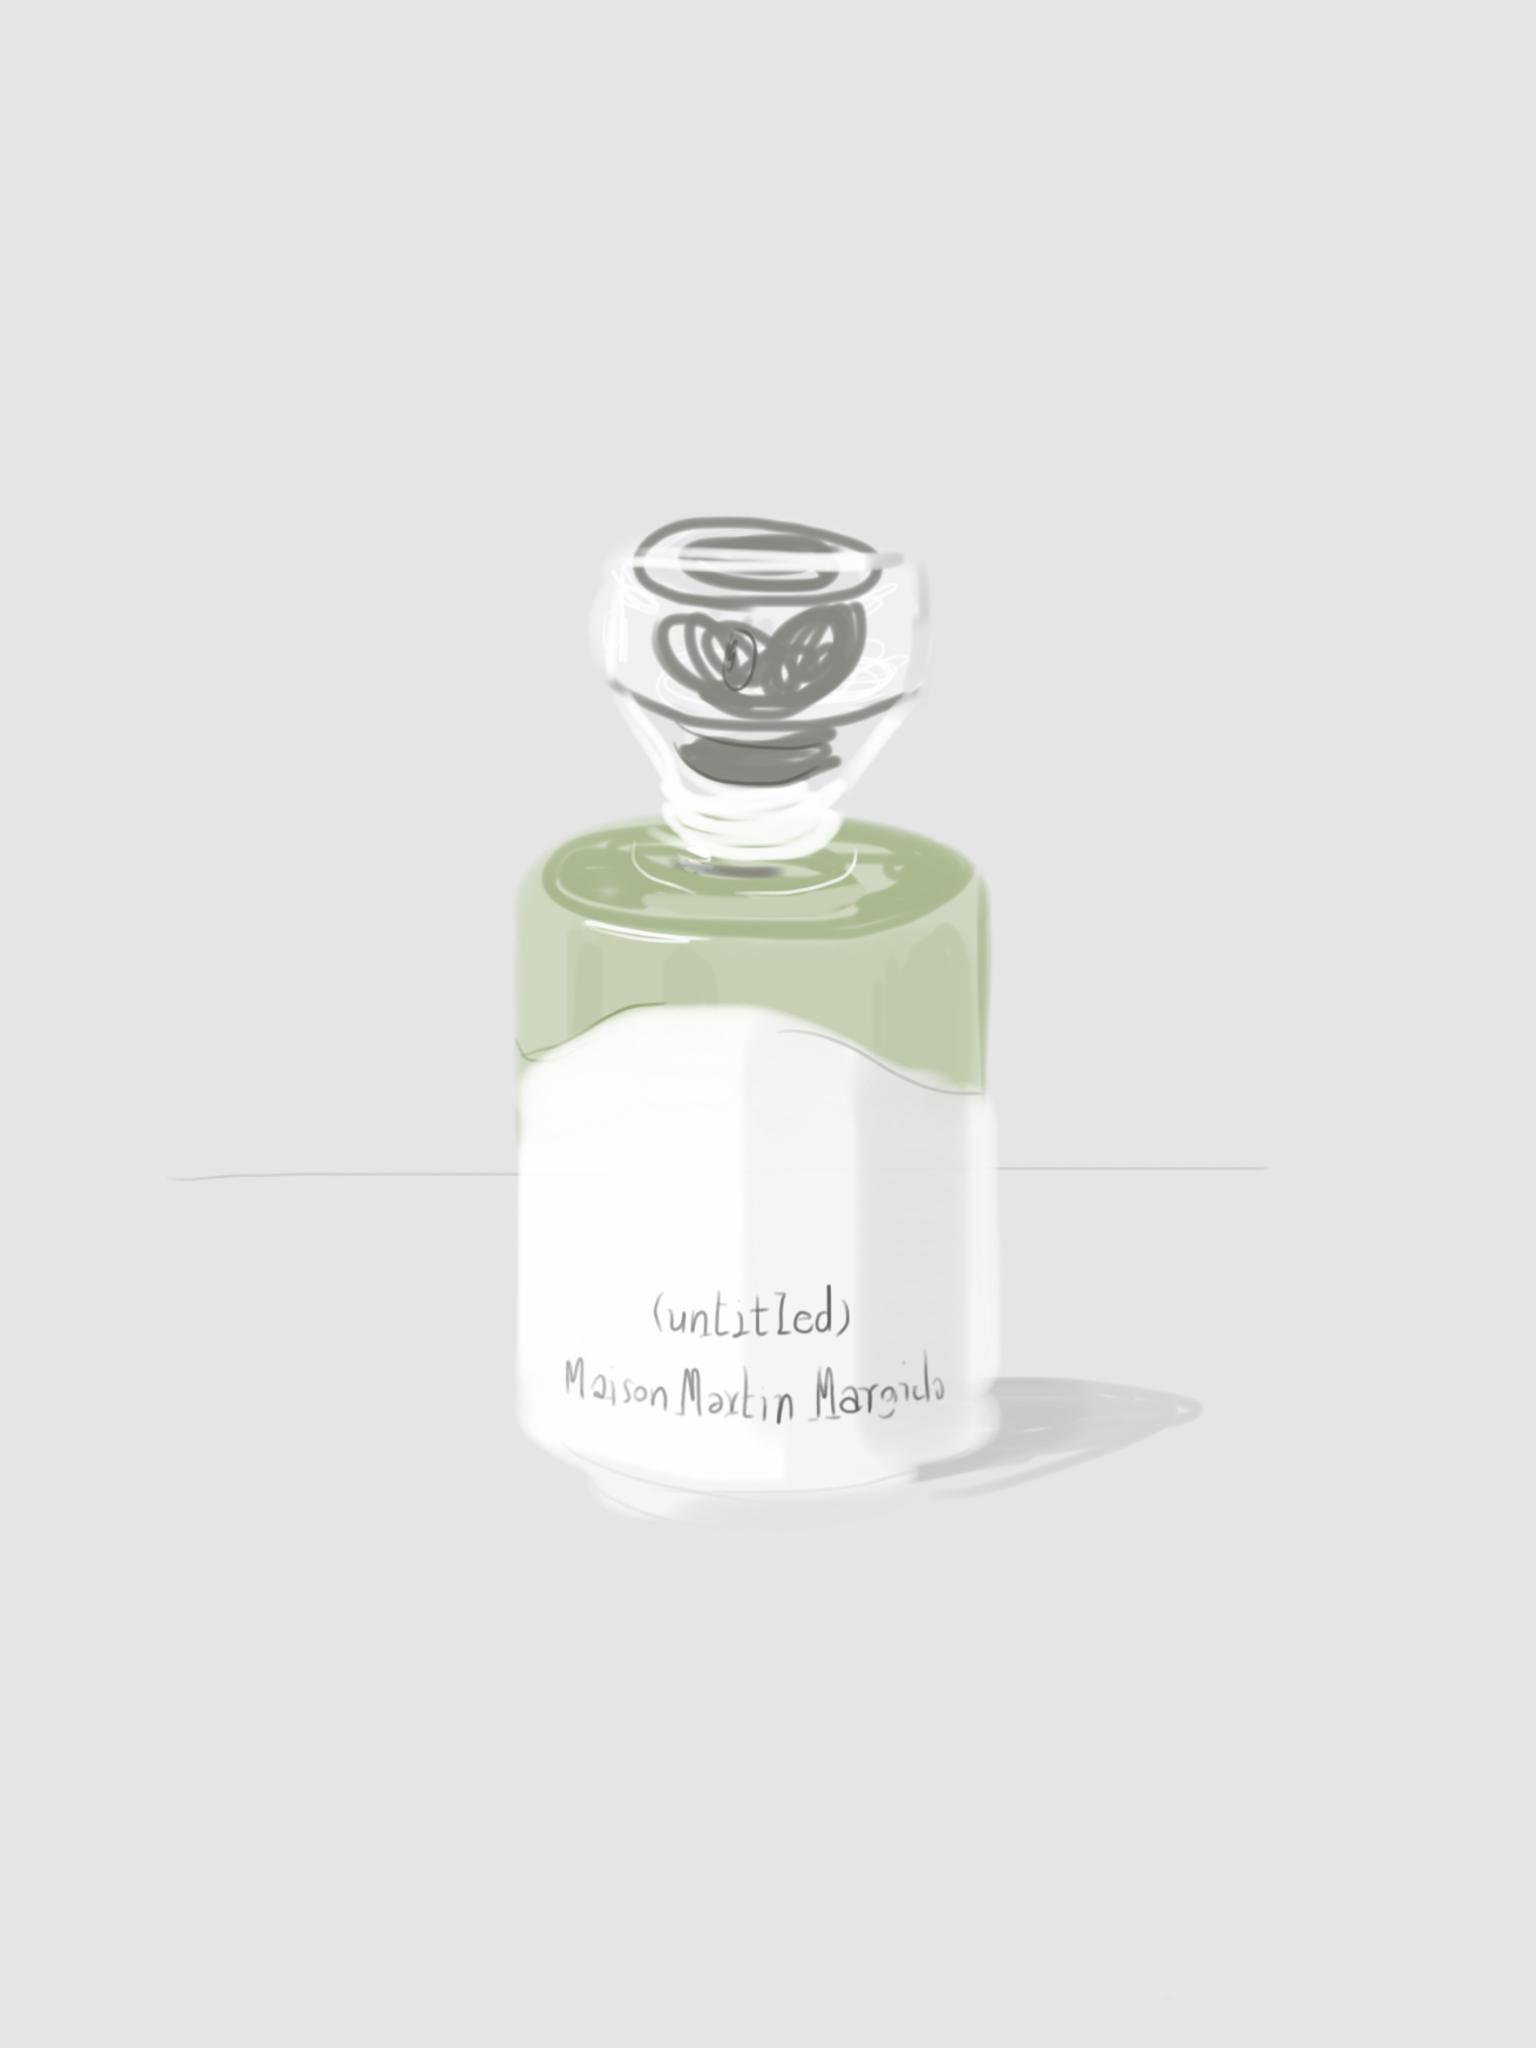 La Pureté bottle illustration by Silvana Mariani